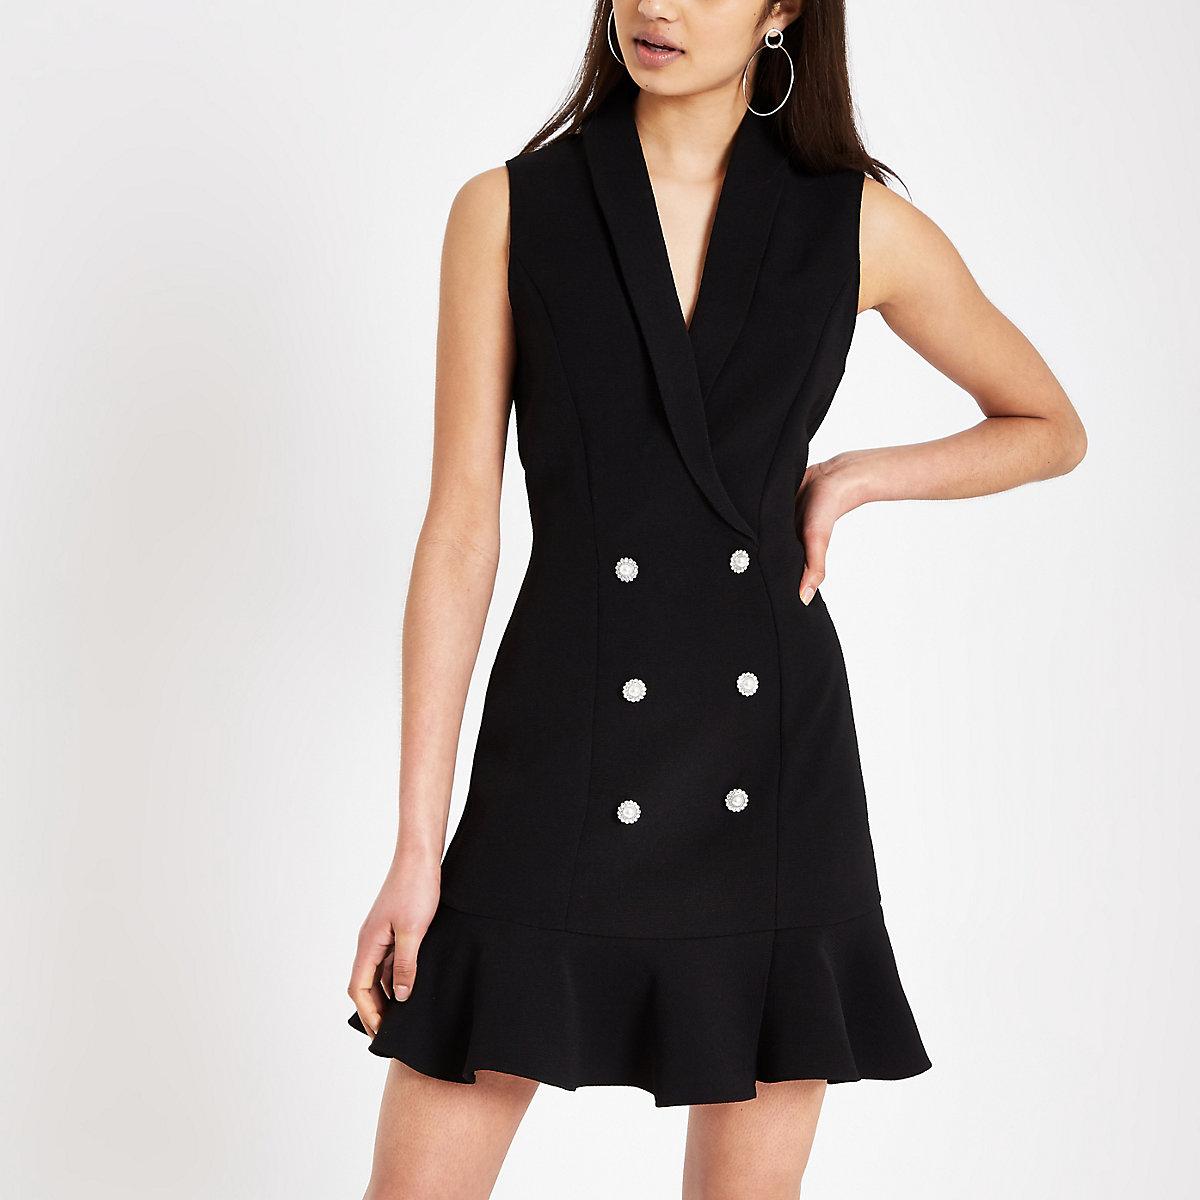 Black diamante embellished bodycon tux dress